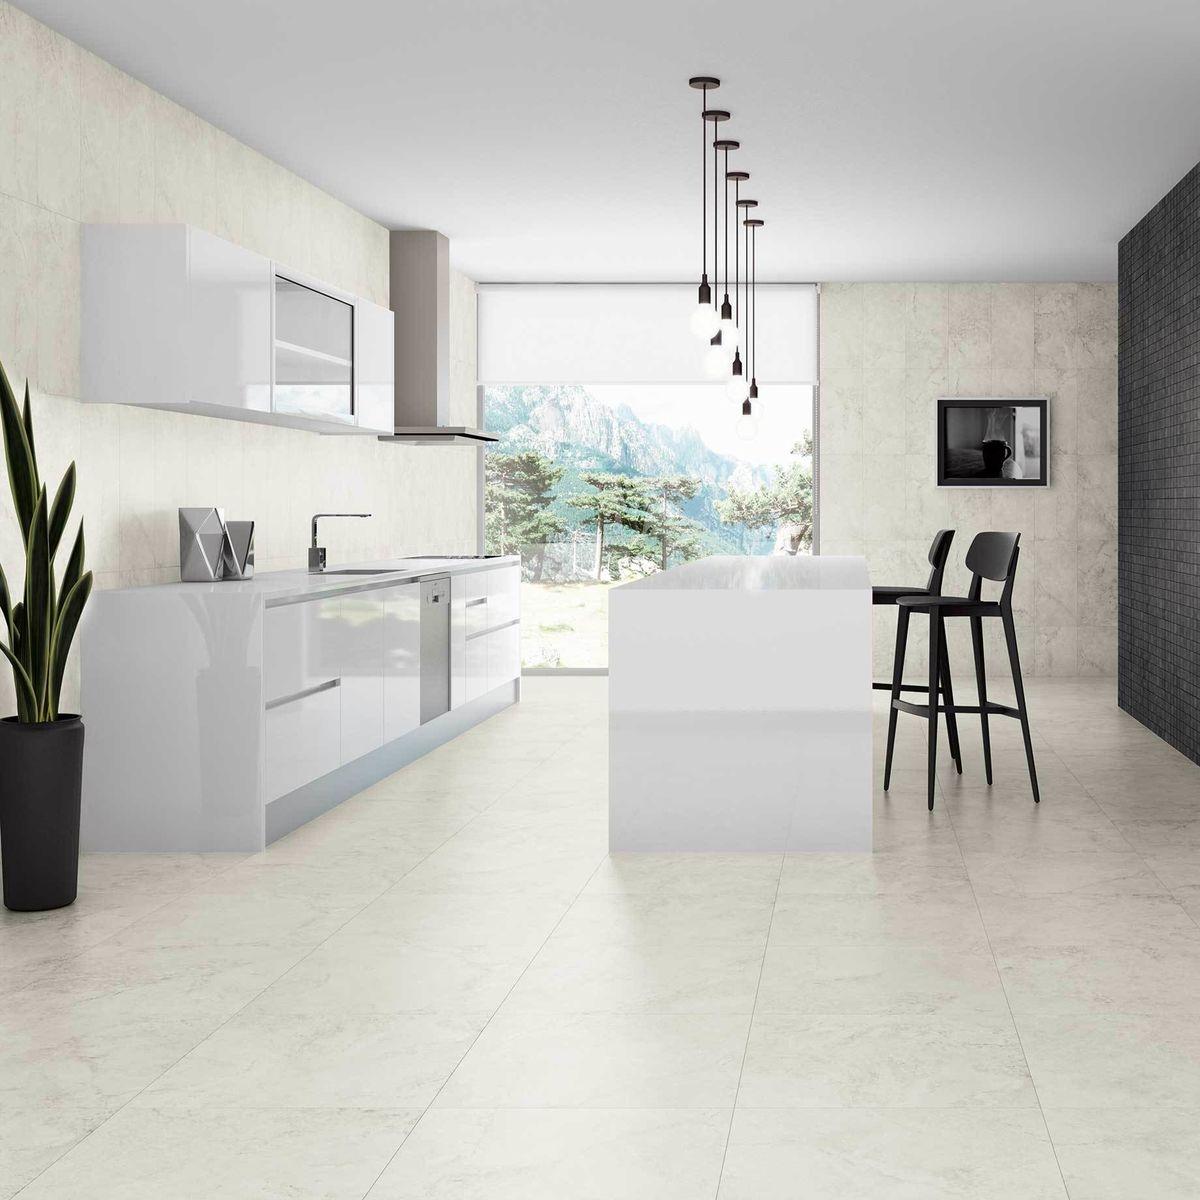 aeduca02-1-white-stone-effect-floor-tile_b081c2fe8e589f9538d6c5832aaae98a